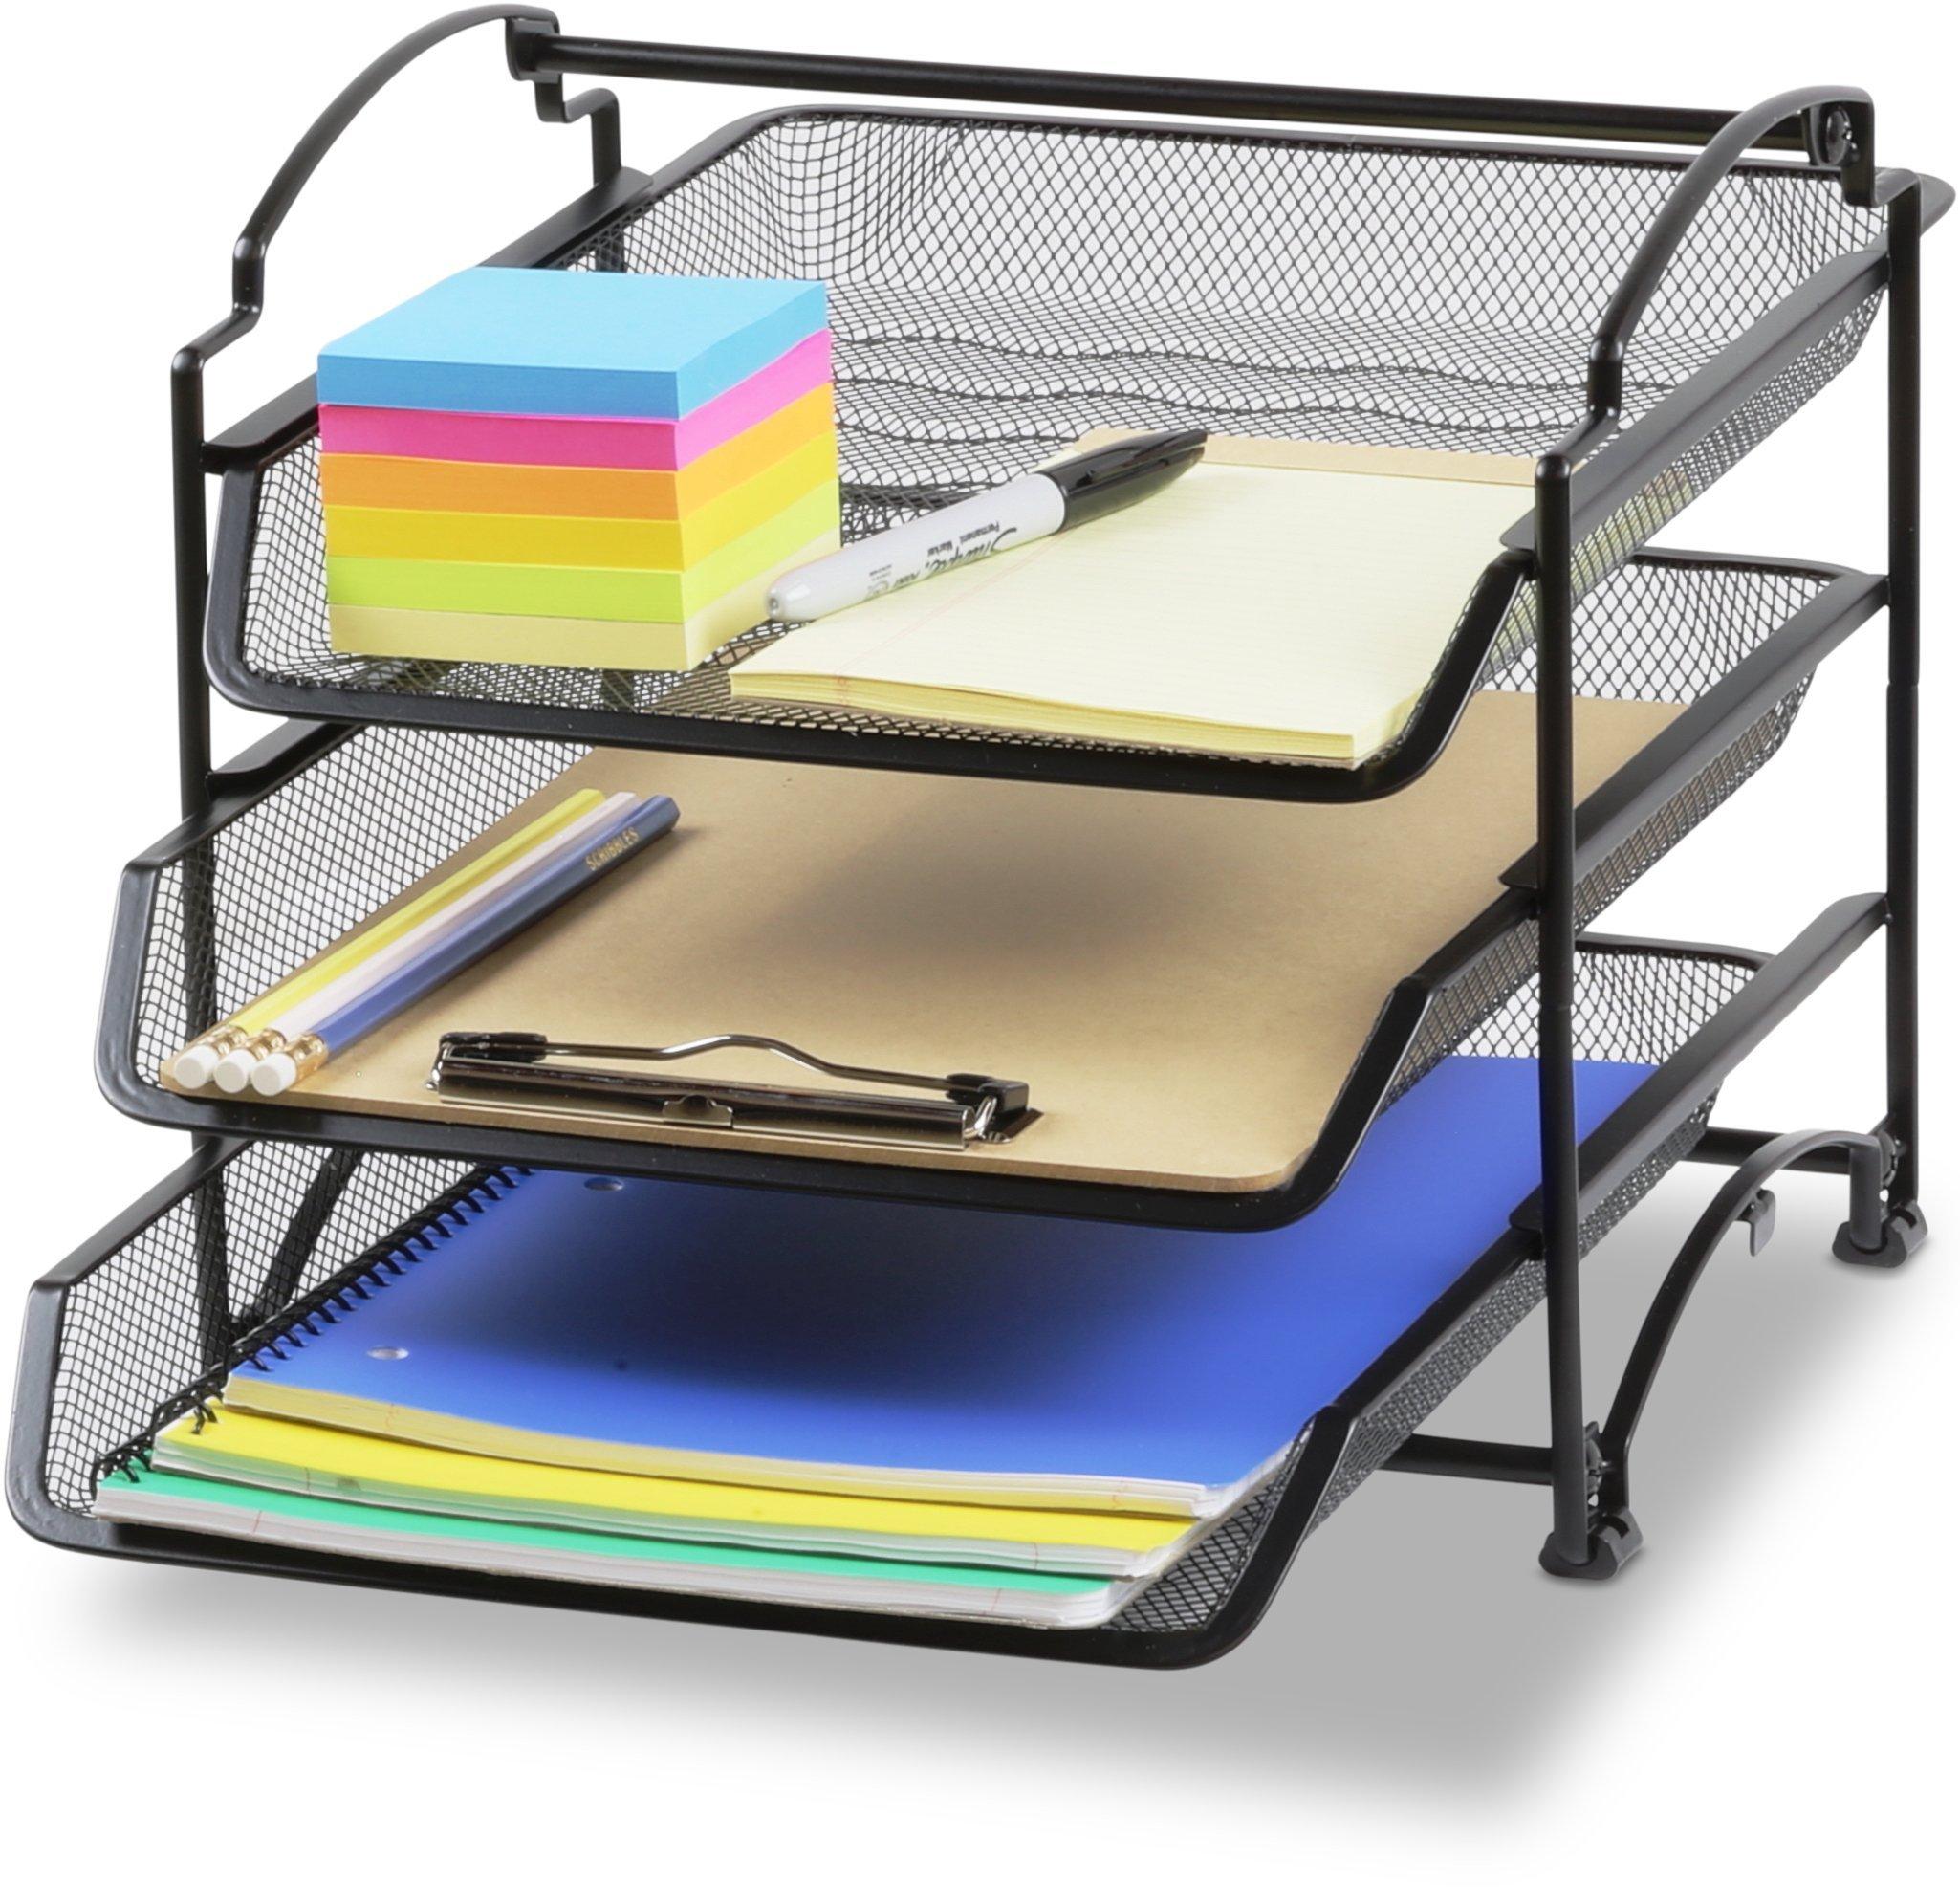 SimpleHouseware 3 Tier STACKABLE Desktop Document Letter Tray Organizer, Black by Simple Houseware